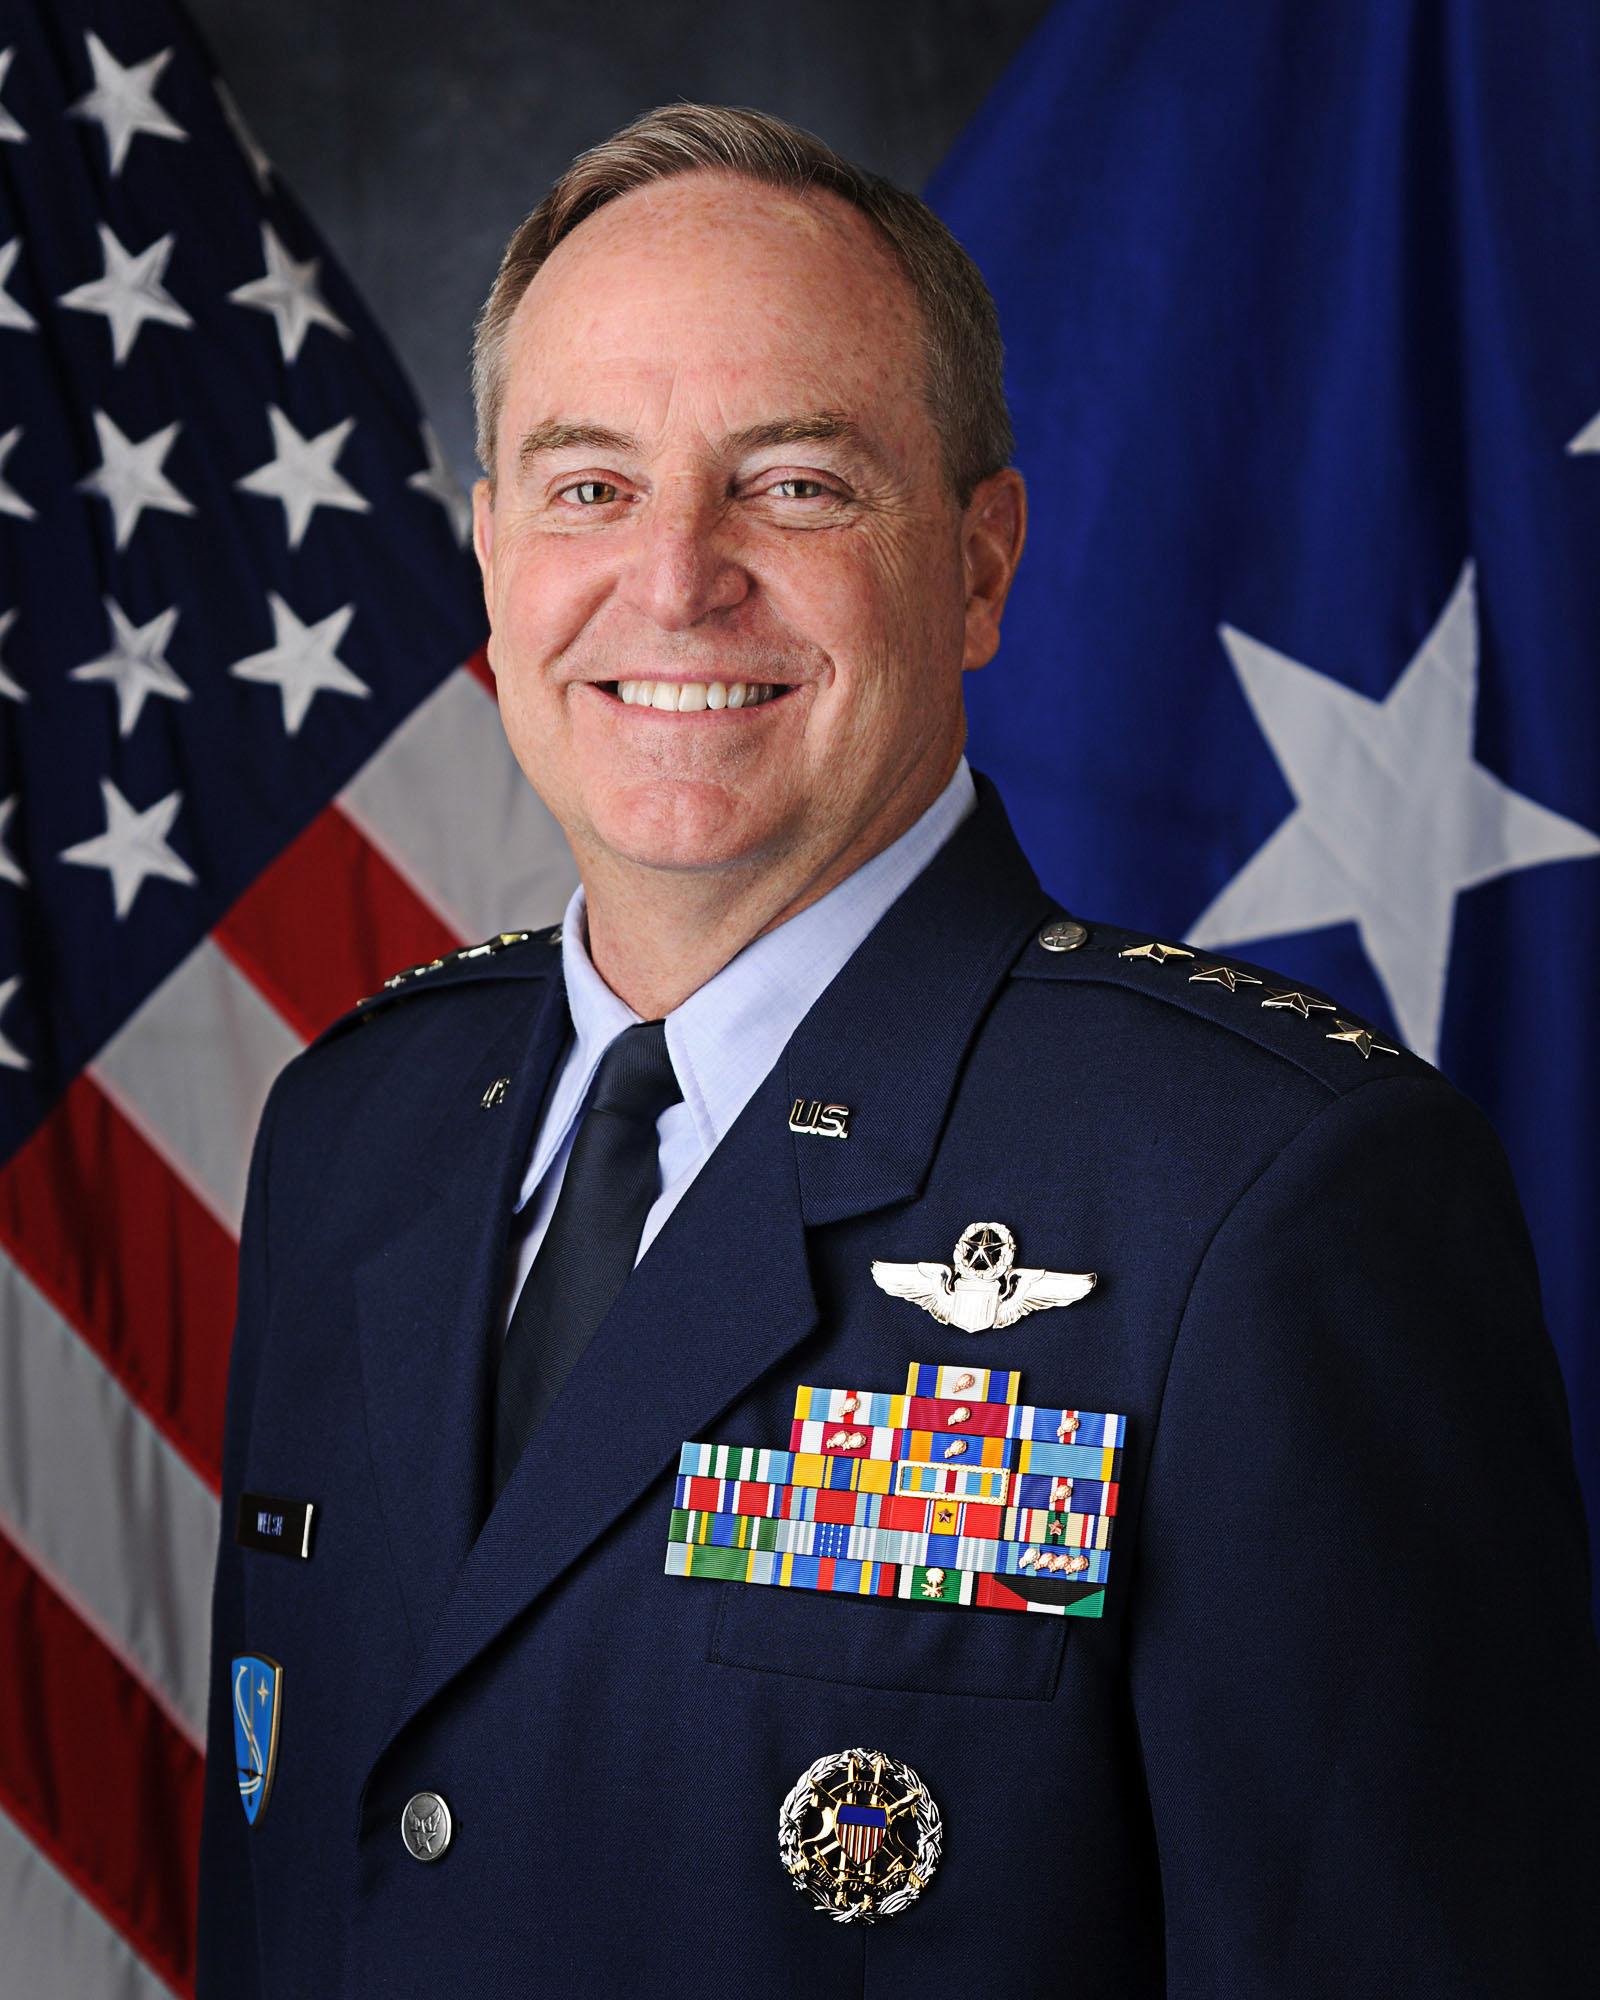 General Mark A. Welsh